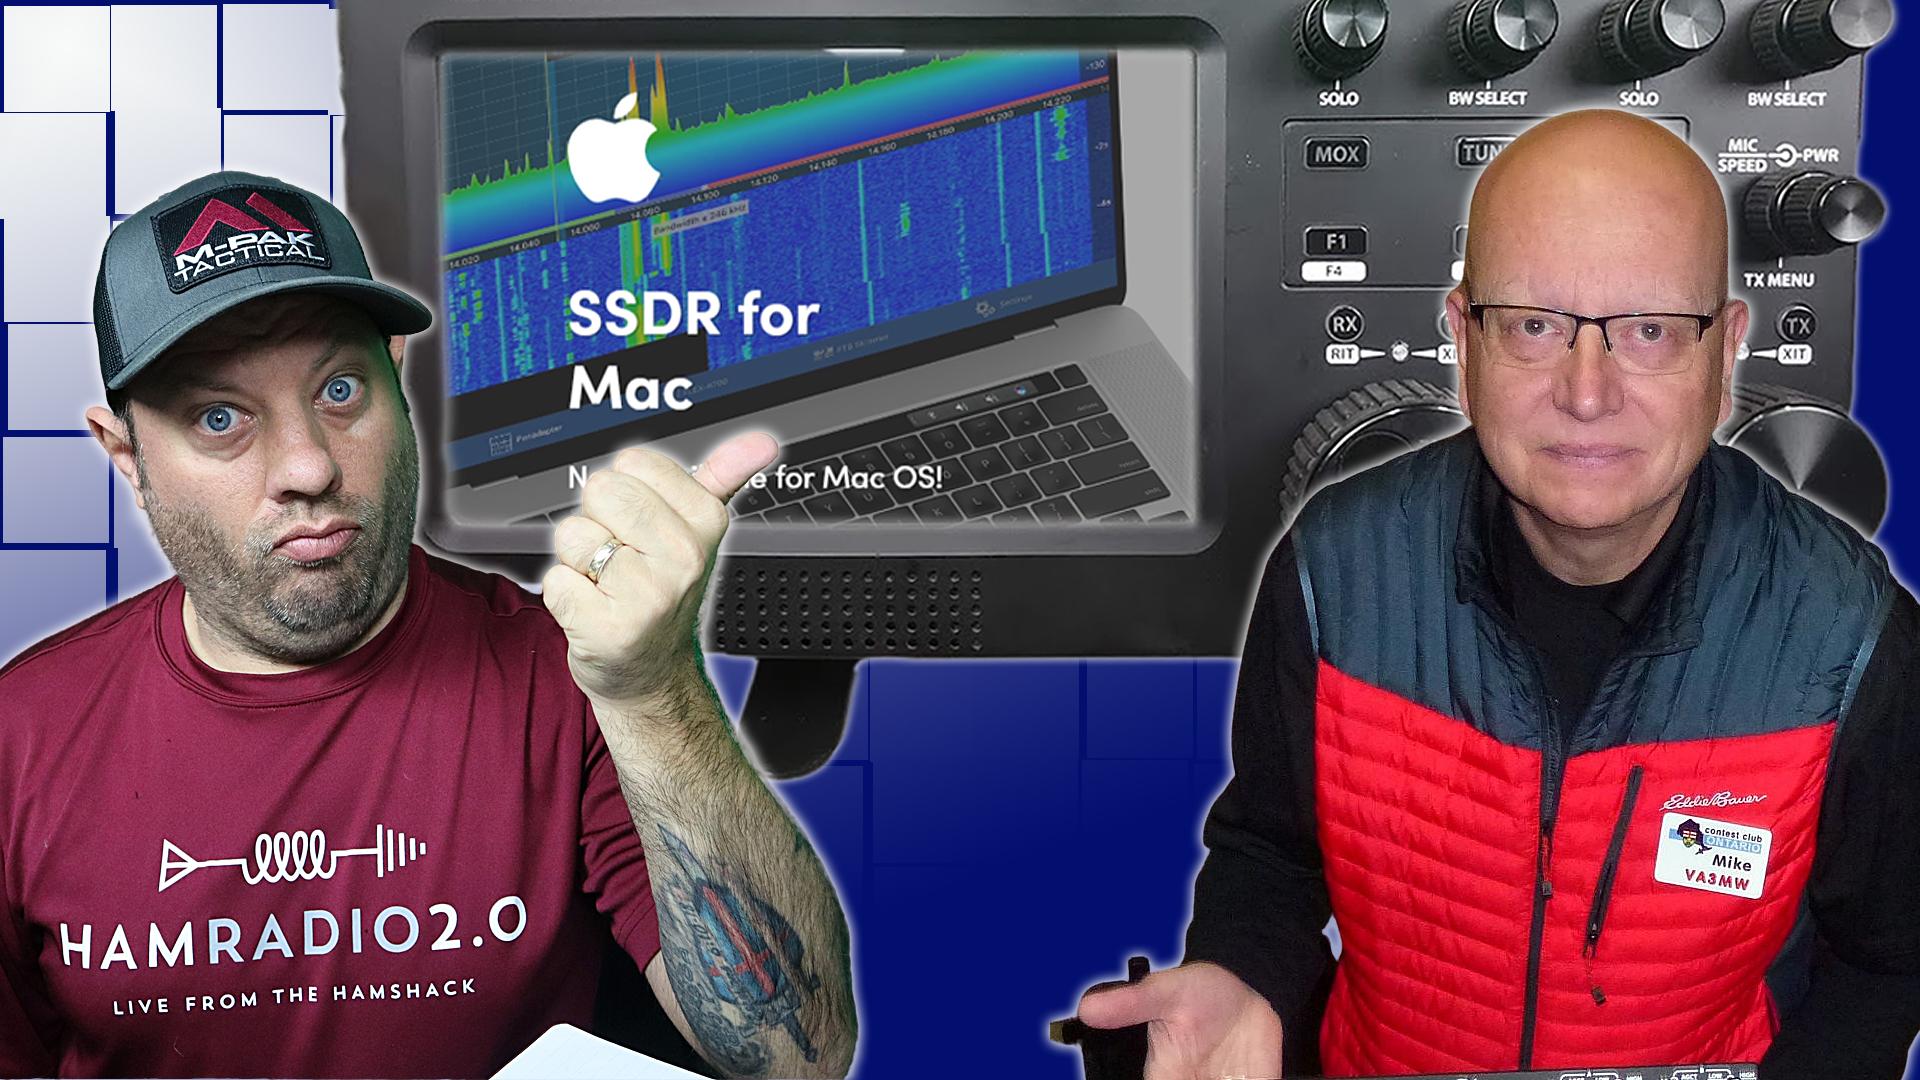 Episode 455: FlexRadio REVEALS SmartSDR for Mac – Ham Radio Software for Mac